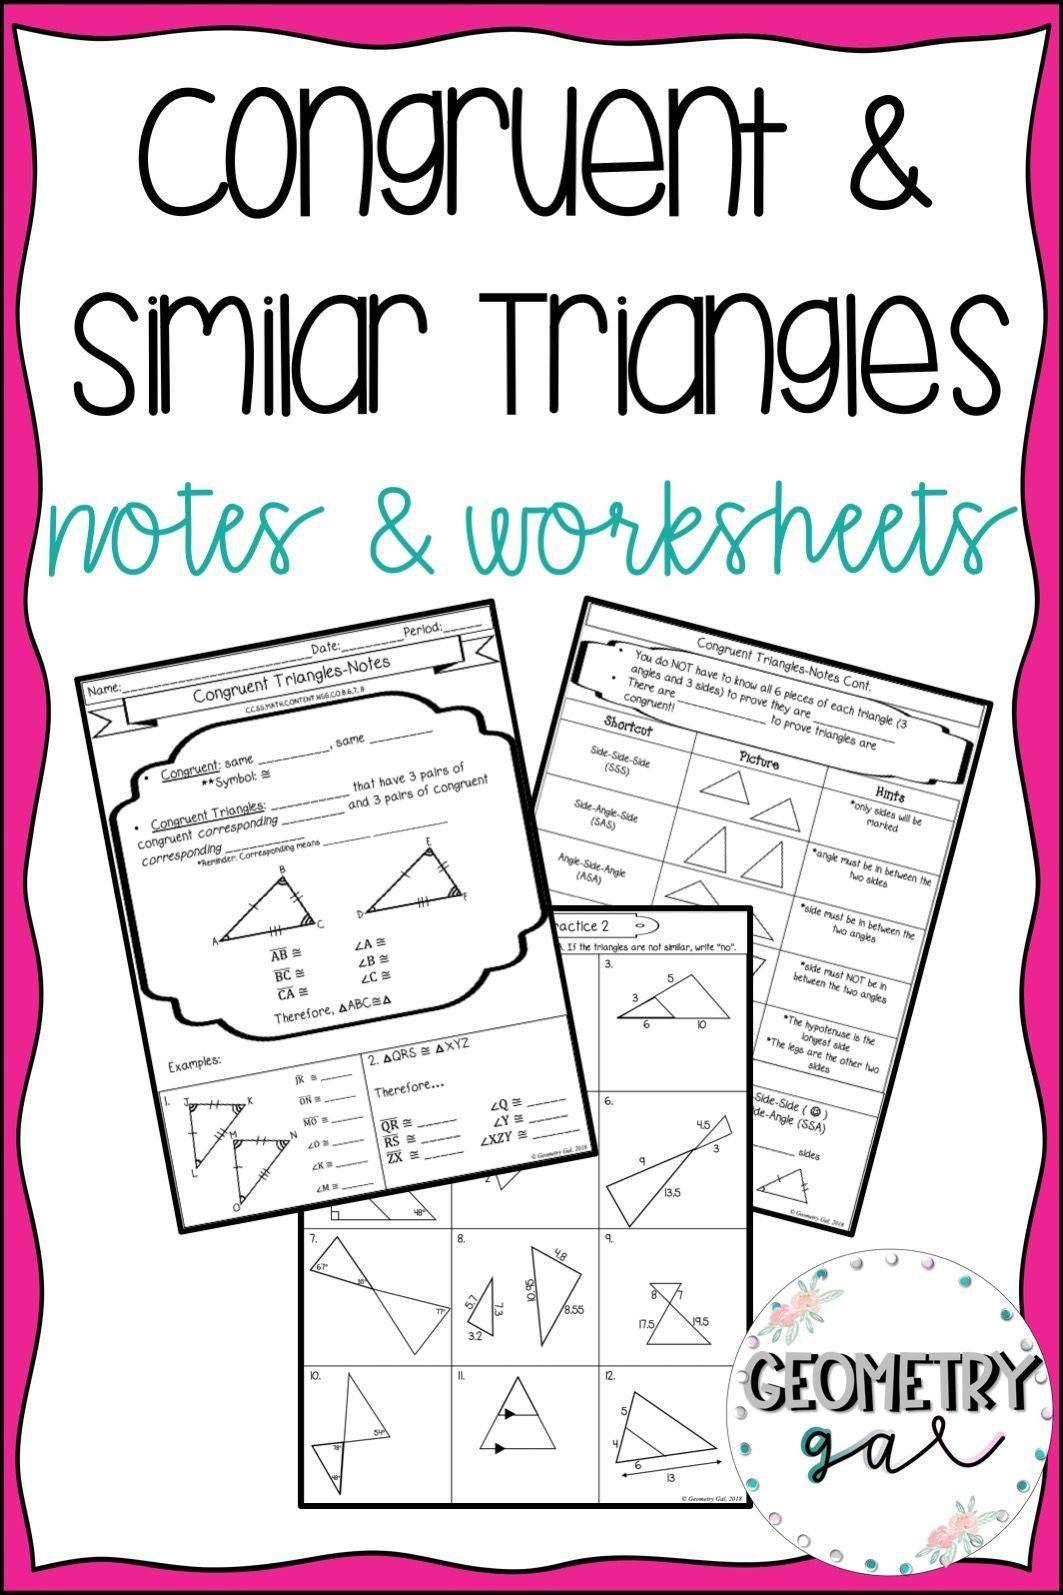 Proving Triangles Congruent Worksheet Sas Sss asa Worksheet